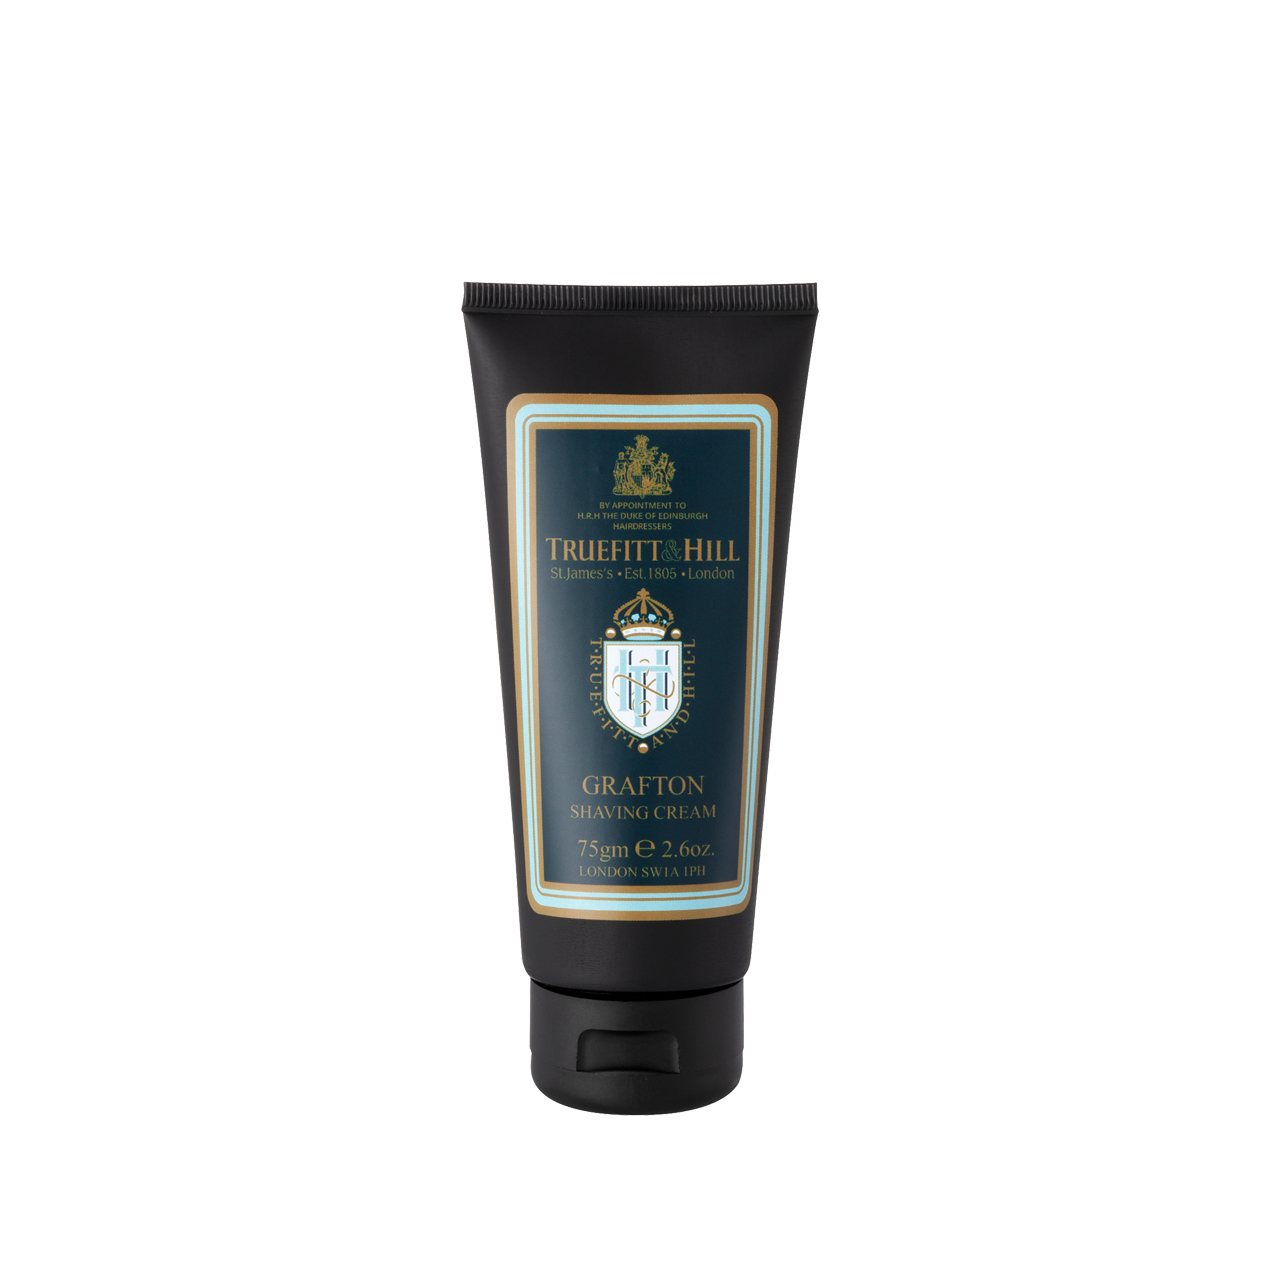 Grafton - Shaving Cream Tube